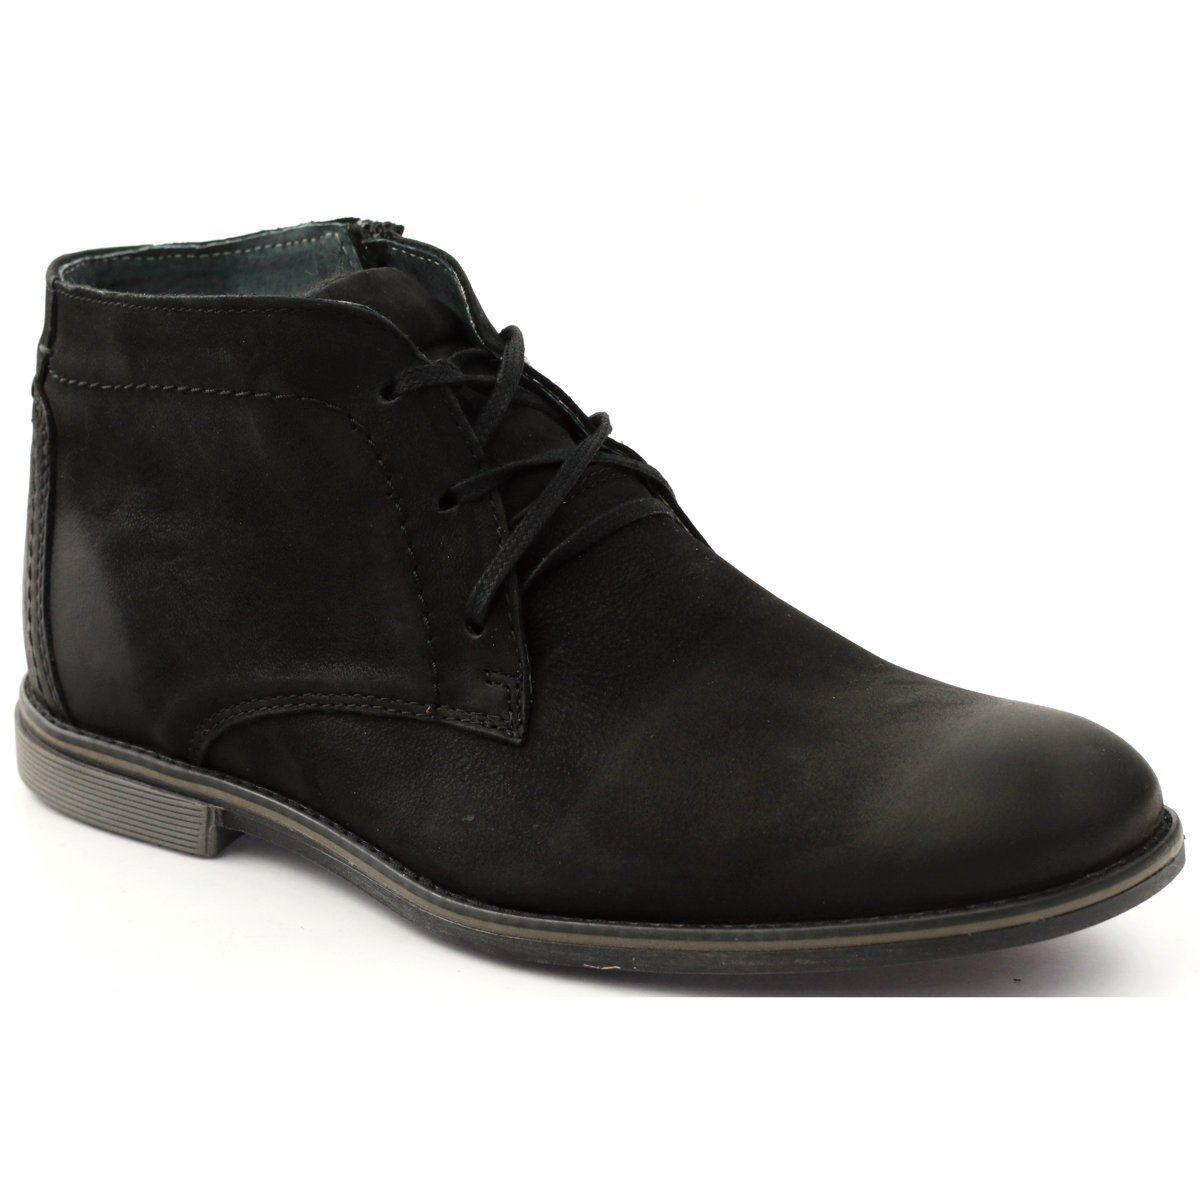 Botki Sztyblety Na Suwak Riko 817 Czarne Chukka Boots Boots Shoes